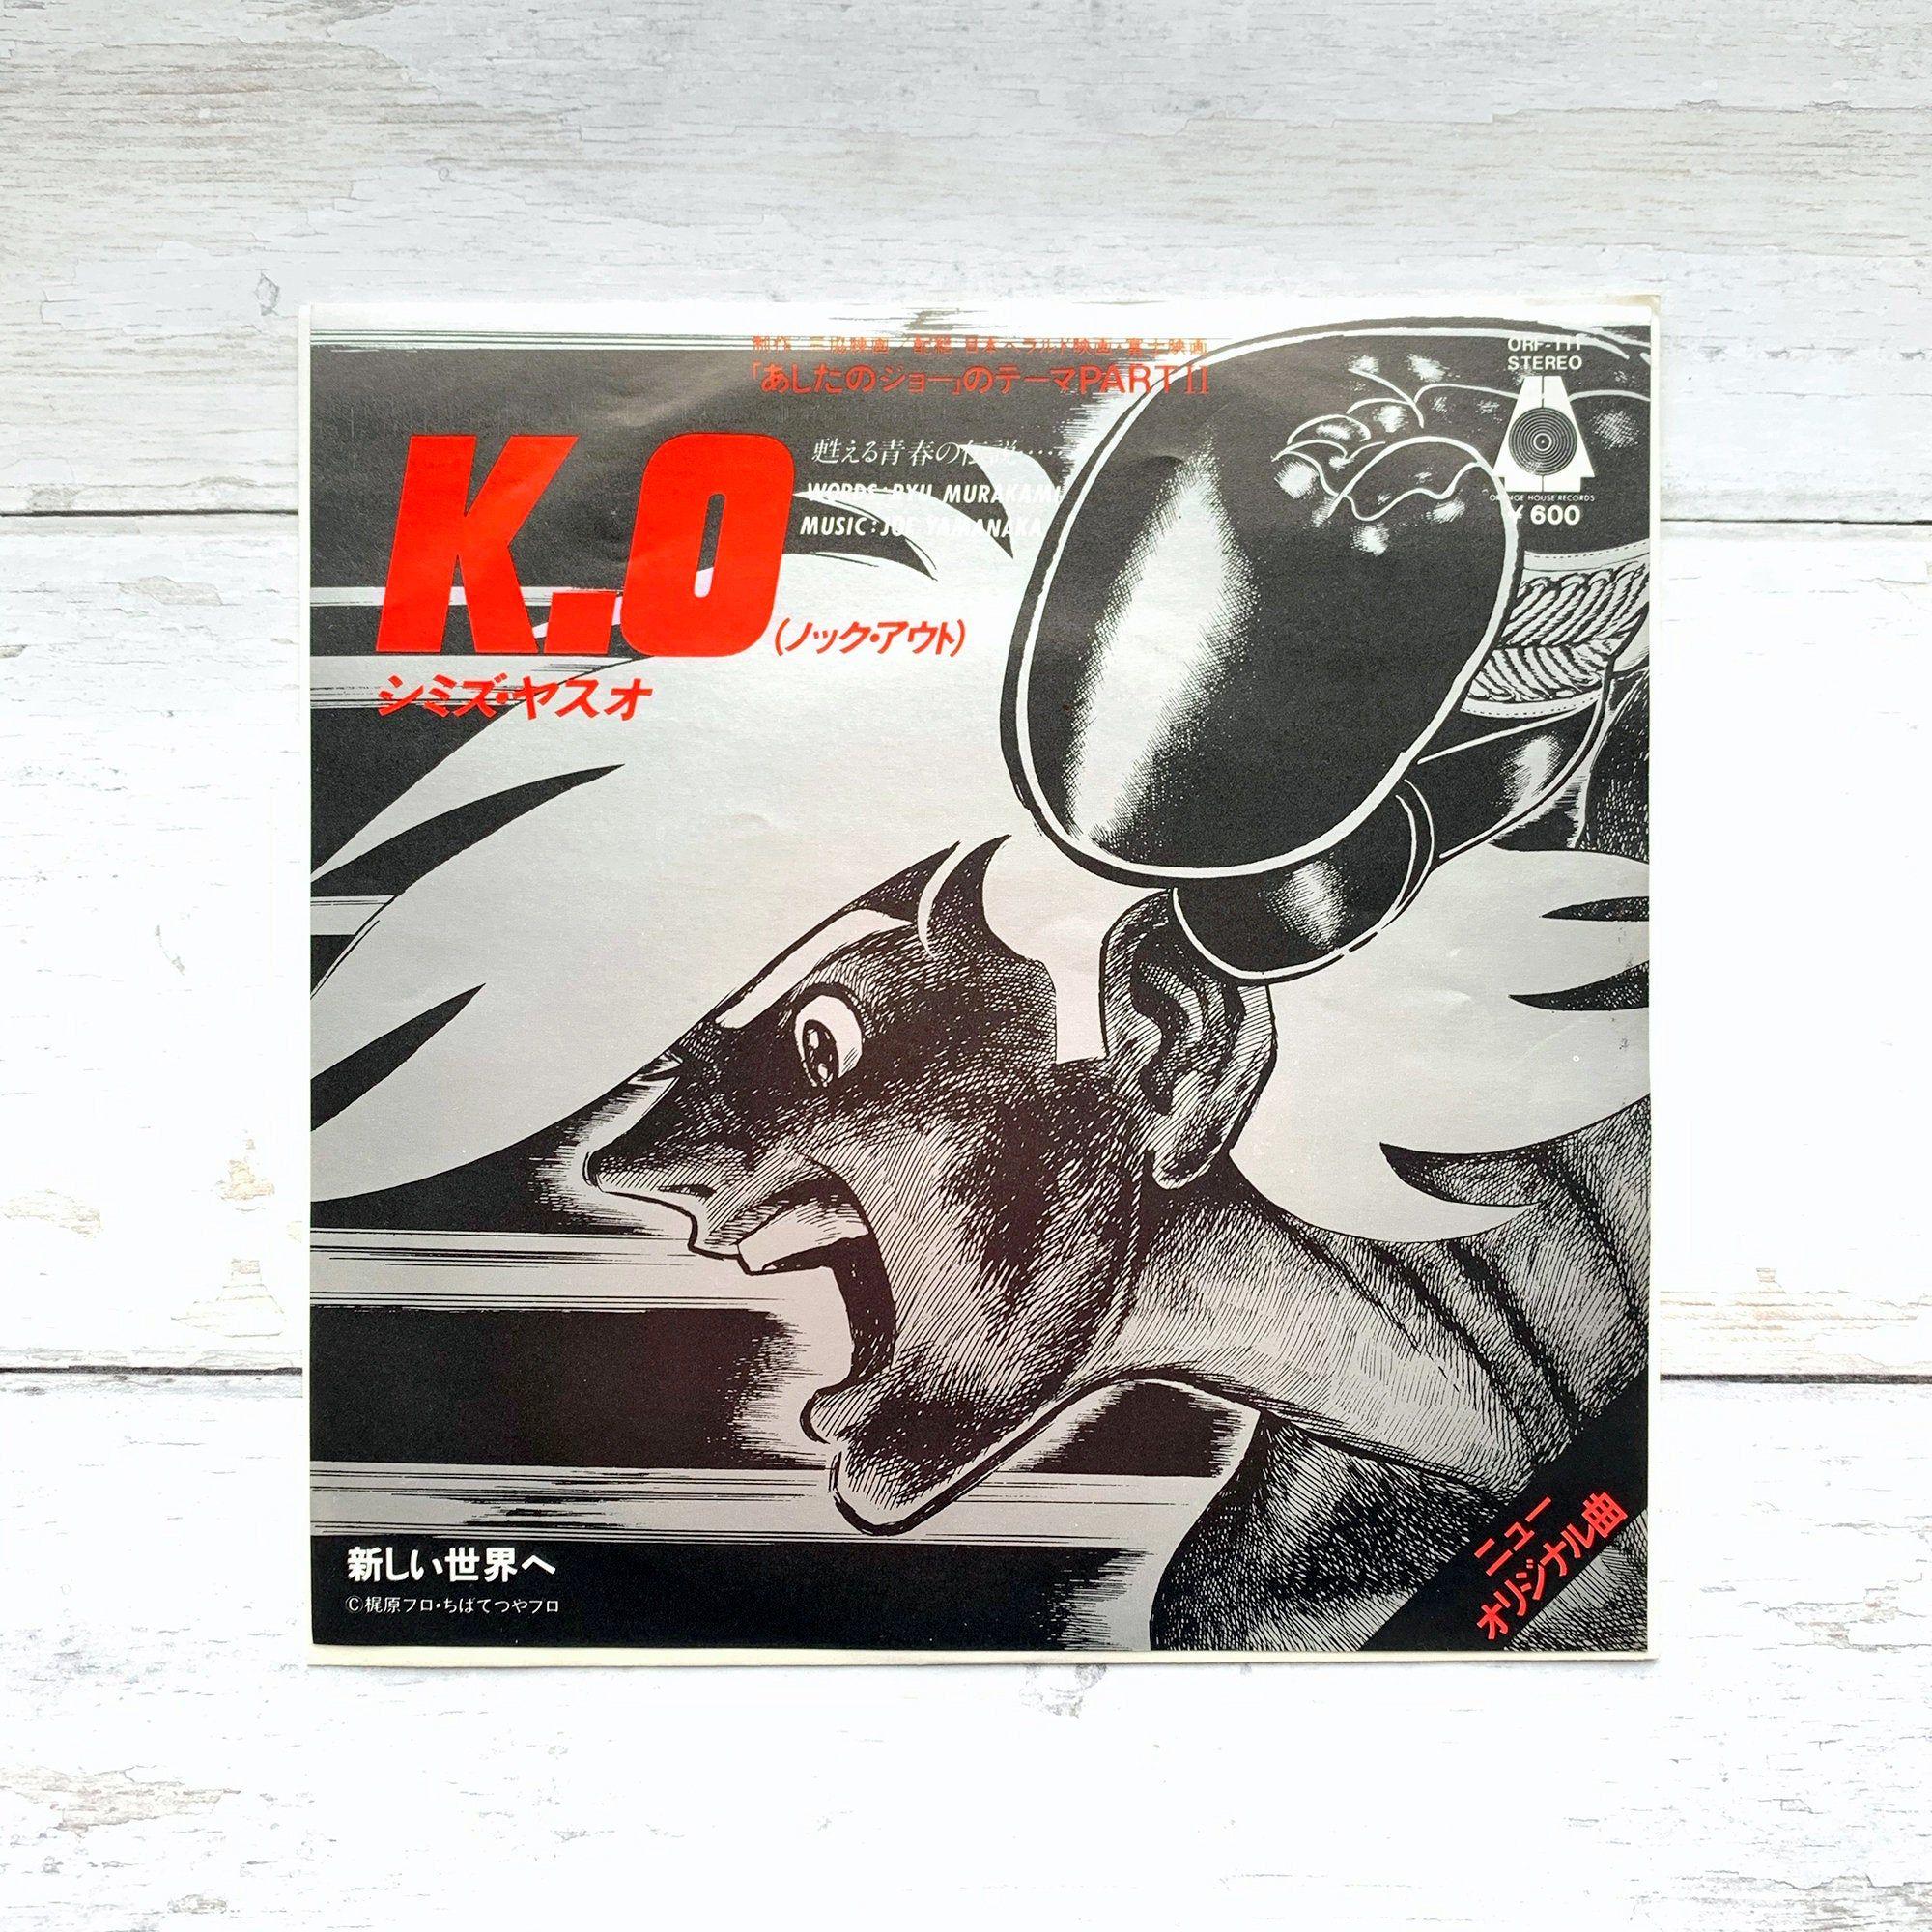 Anime Ashita no Joe K.O Knock Out Vintage Vinyl Record